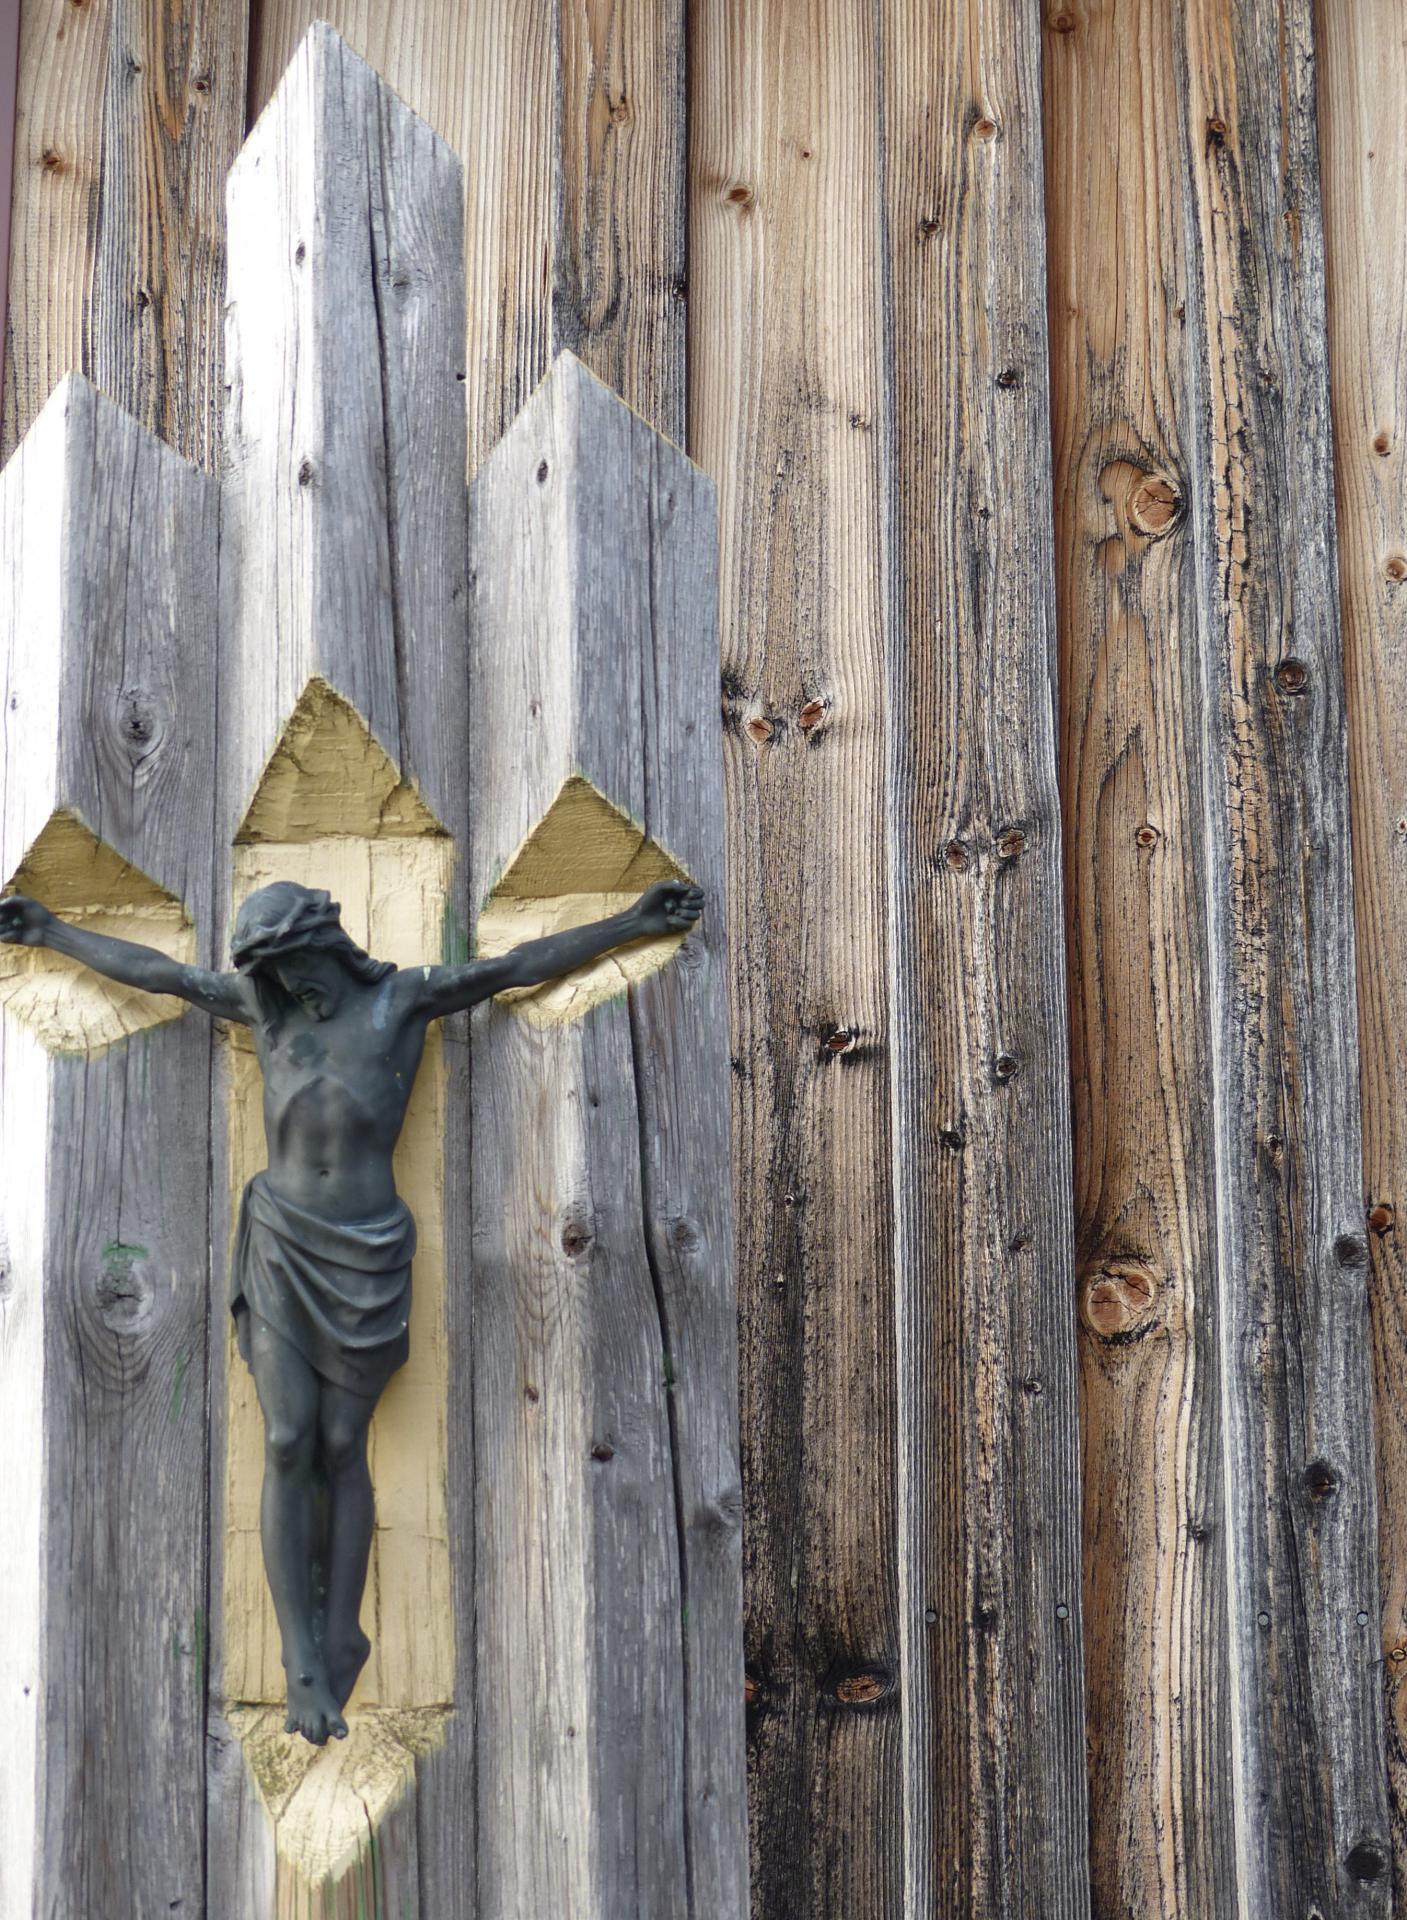 Kreuz im Holz